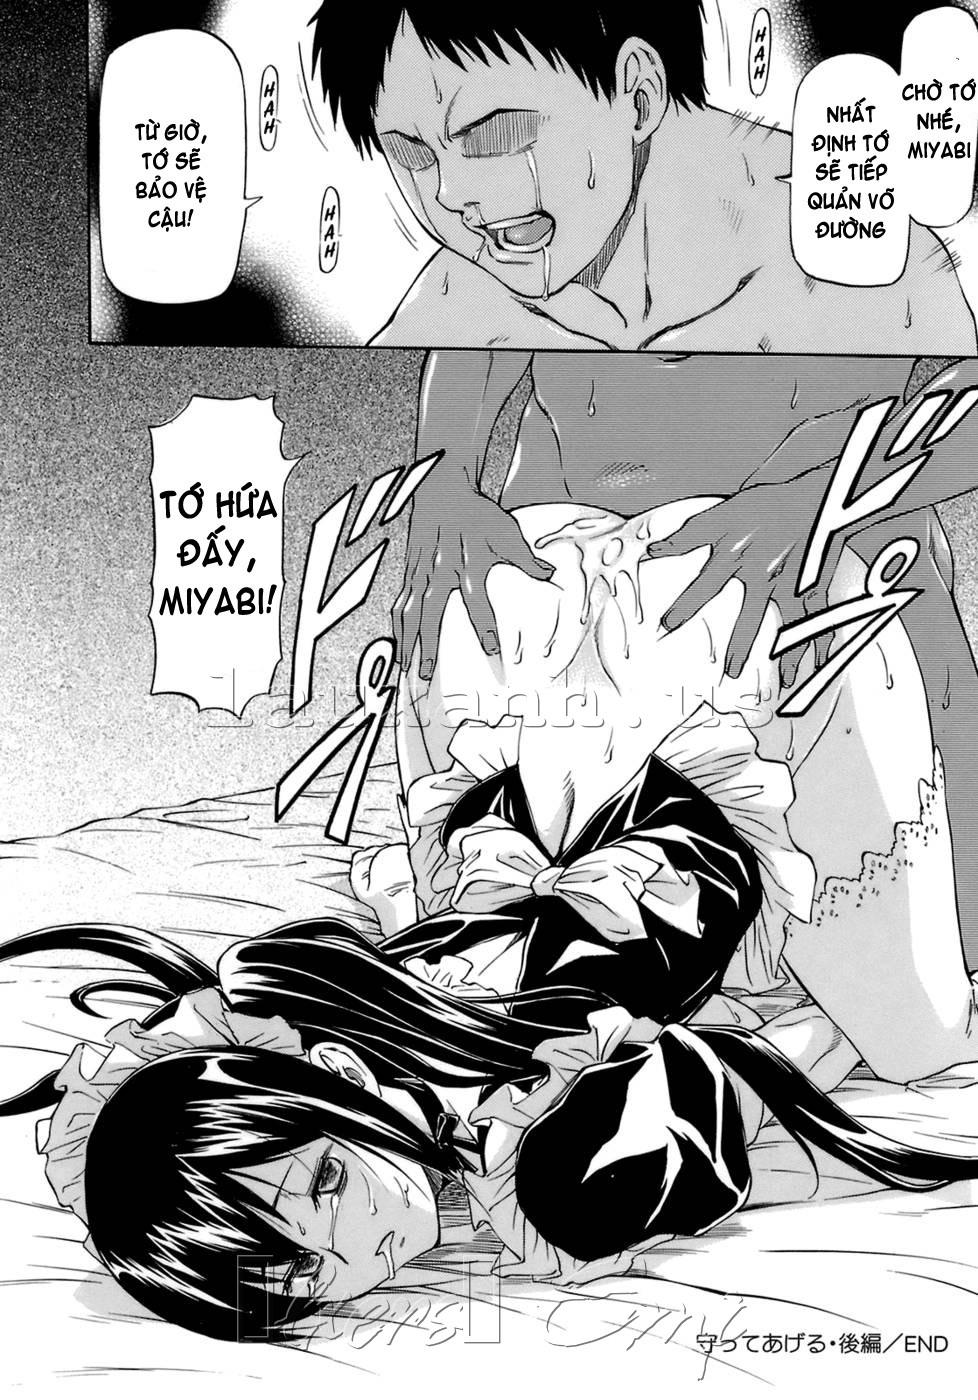 Bf gives gf great orgasm